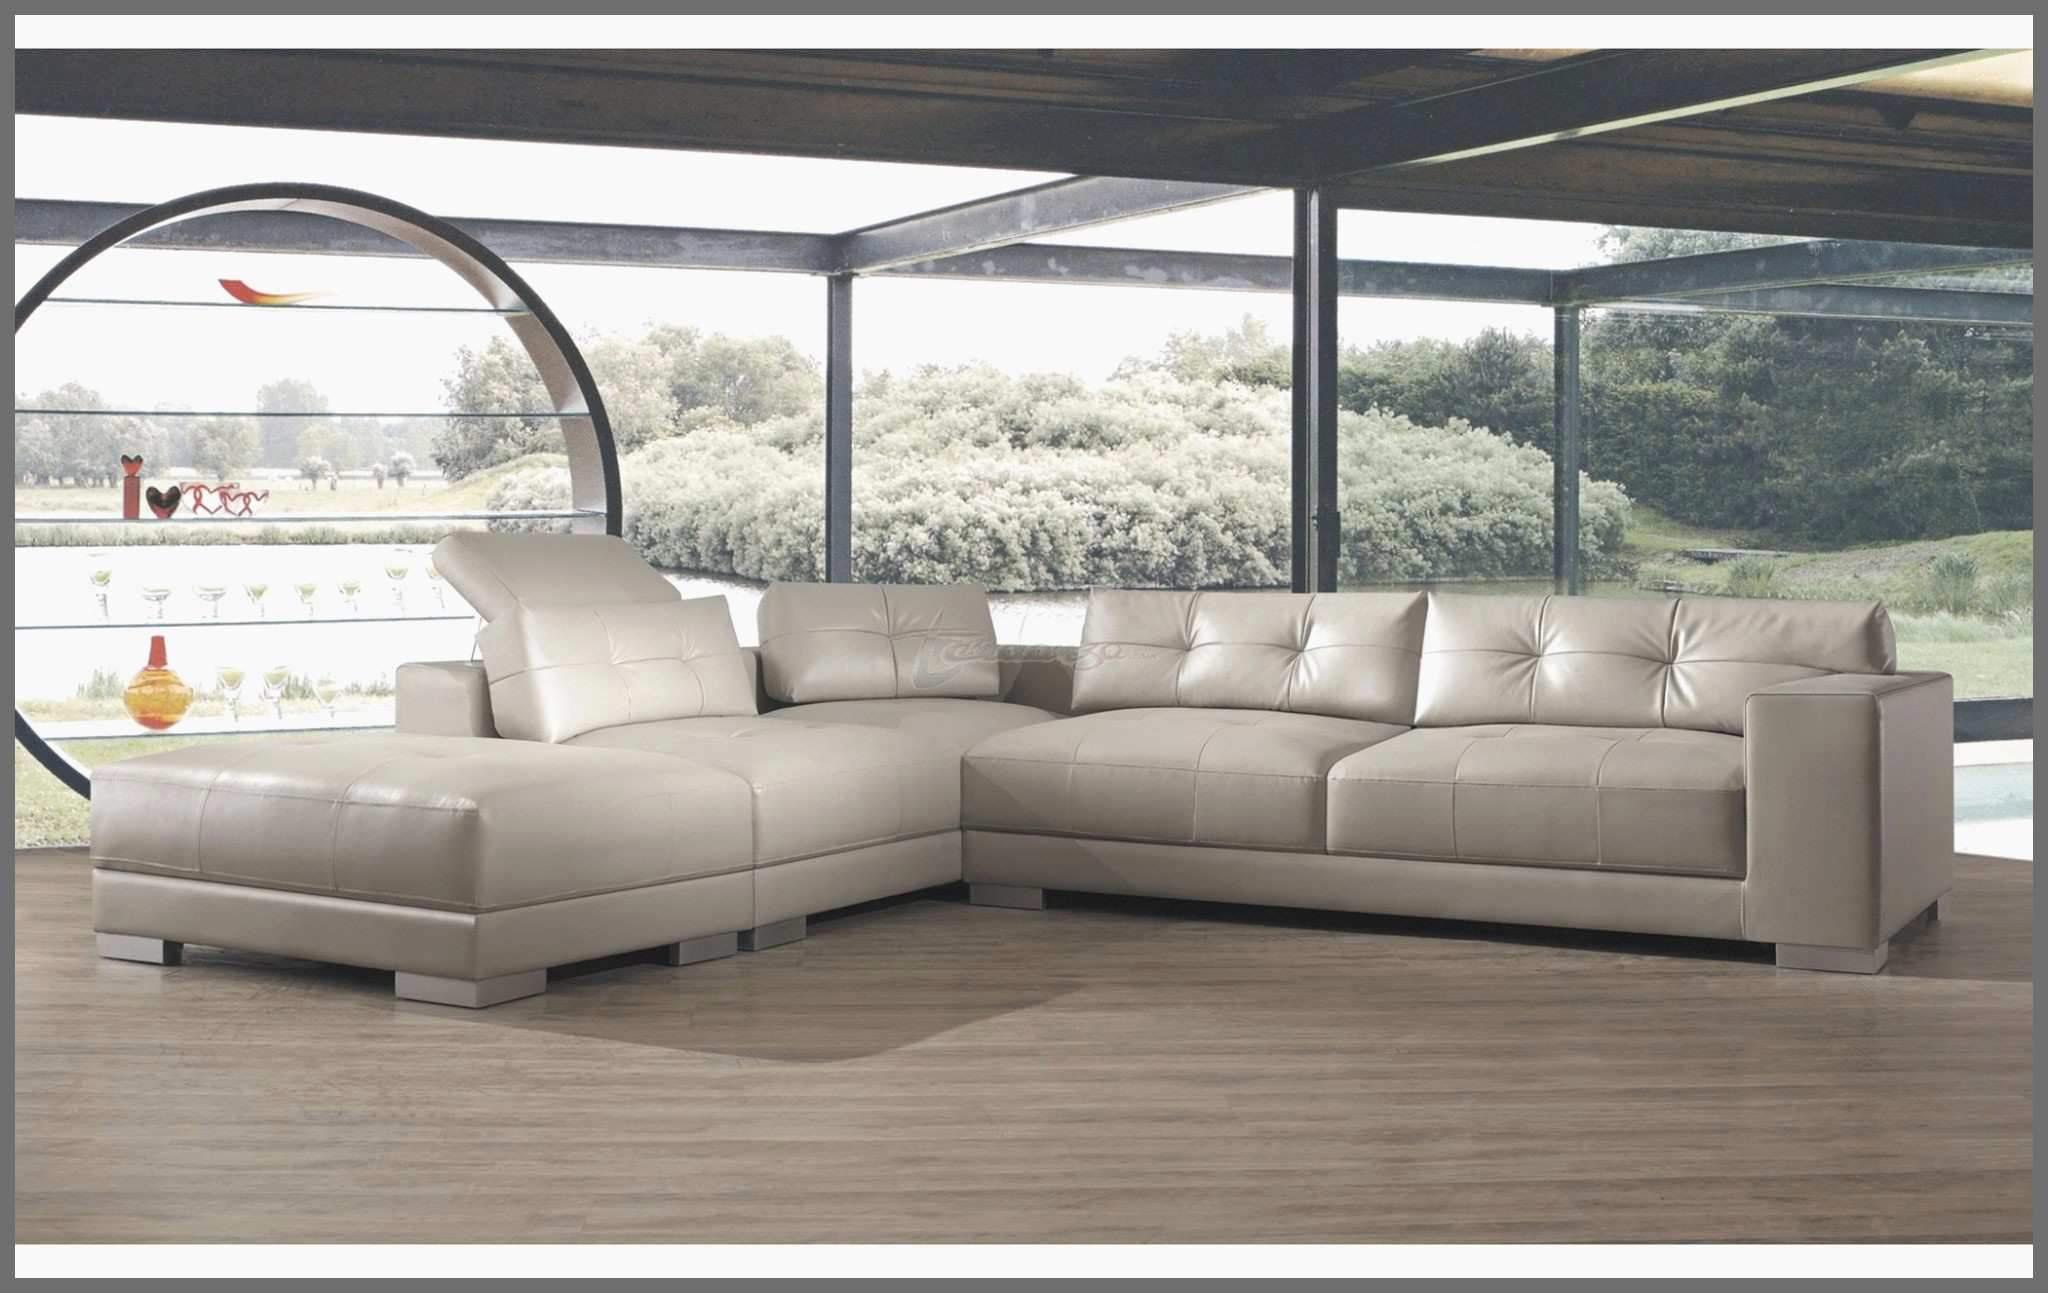 canape angle cuir center charmant leroy merlin chaise fauteuil relax salon meilleur fauteuil salon 0d of canape angle cuir center